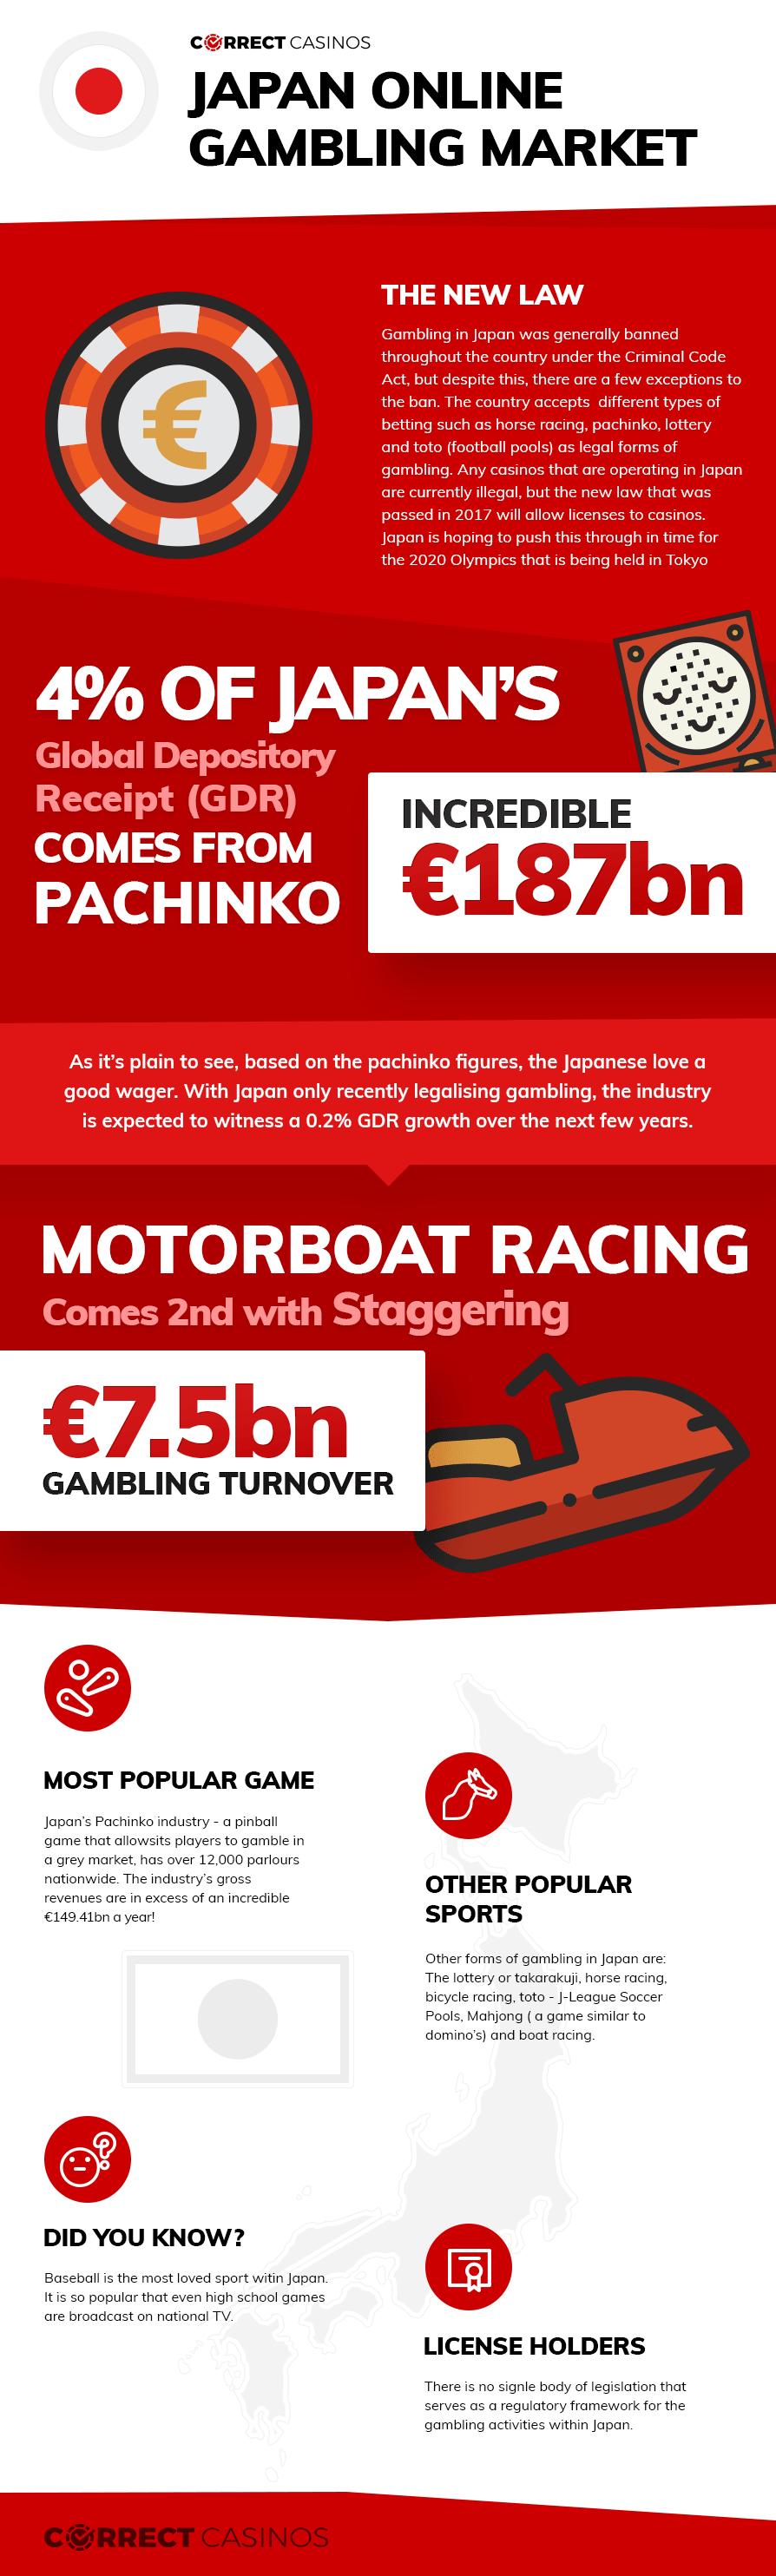 Japan Online Casino Market Infographic